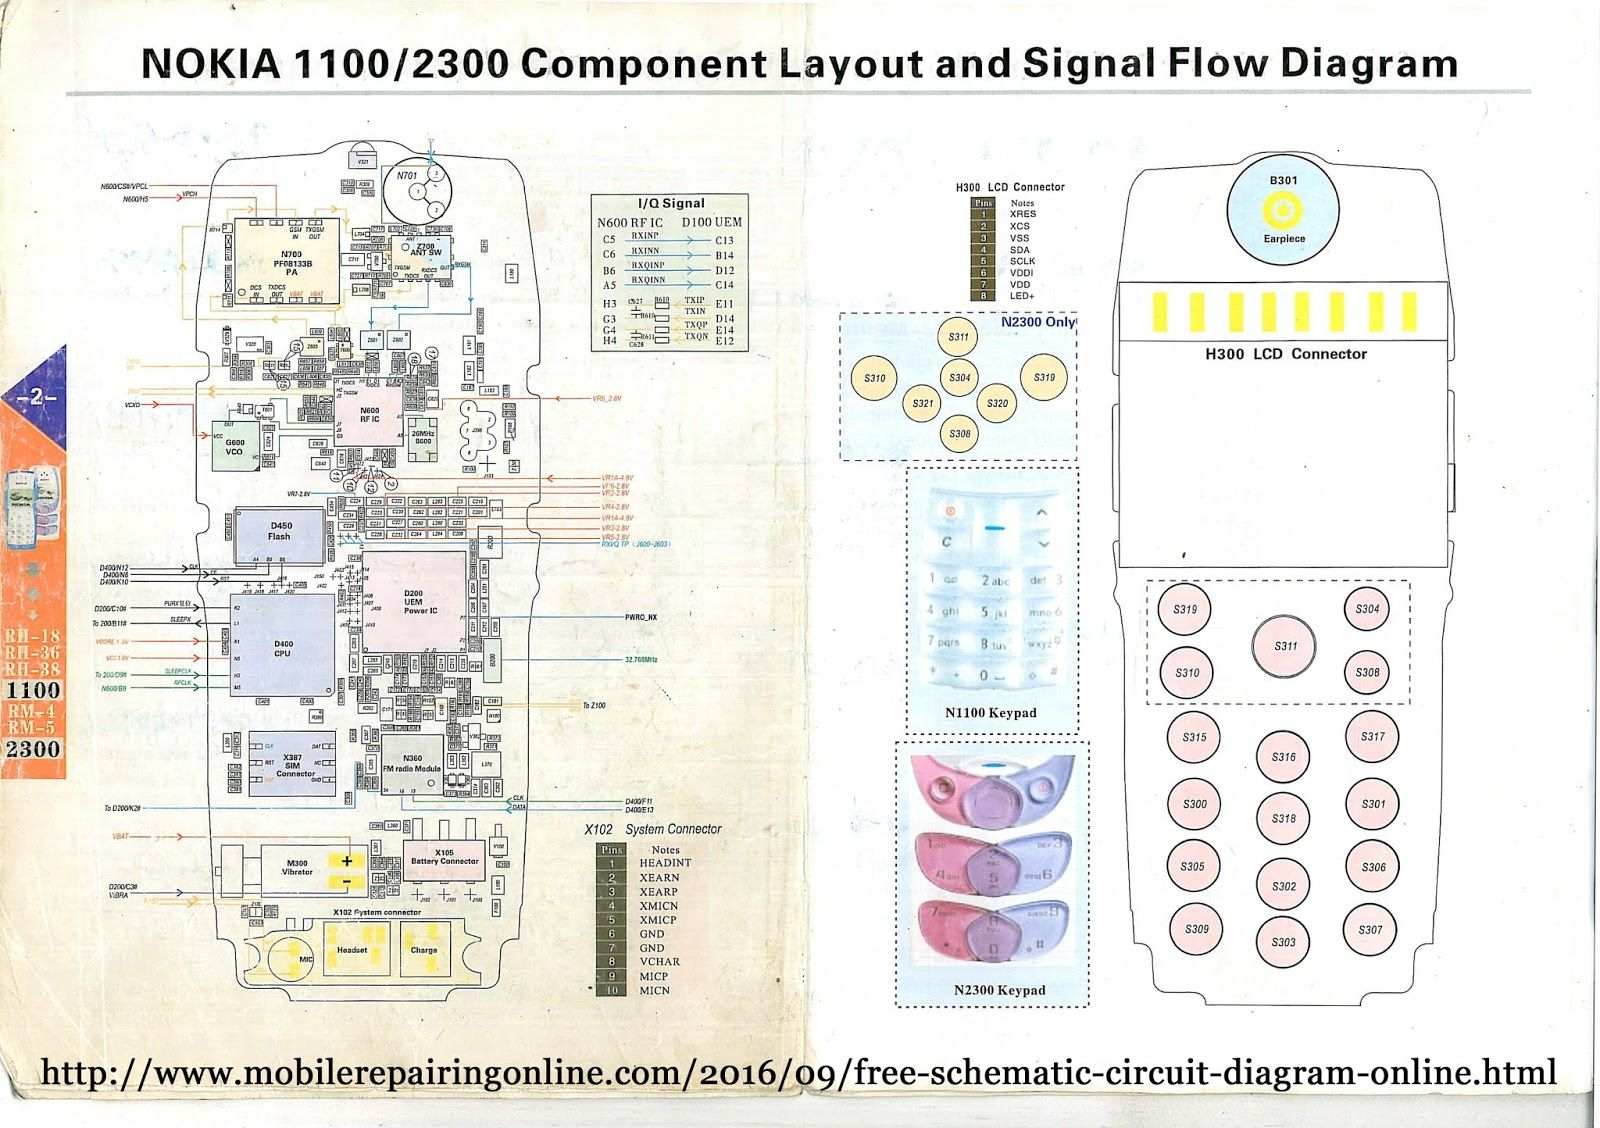 pin by nutan sonwarsha on nokia mobile phone repair mobile phones schematic diagram phone diagram in addition mobile phone schematic [ 1600 x 1128 Pixel ]